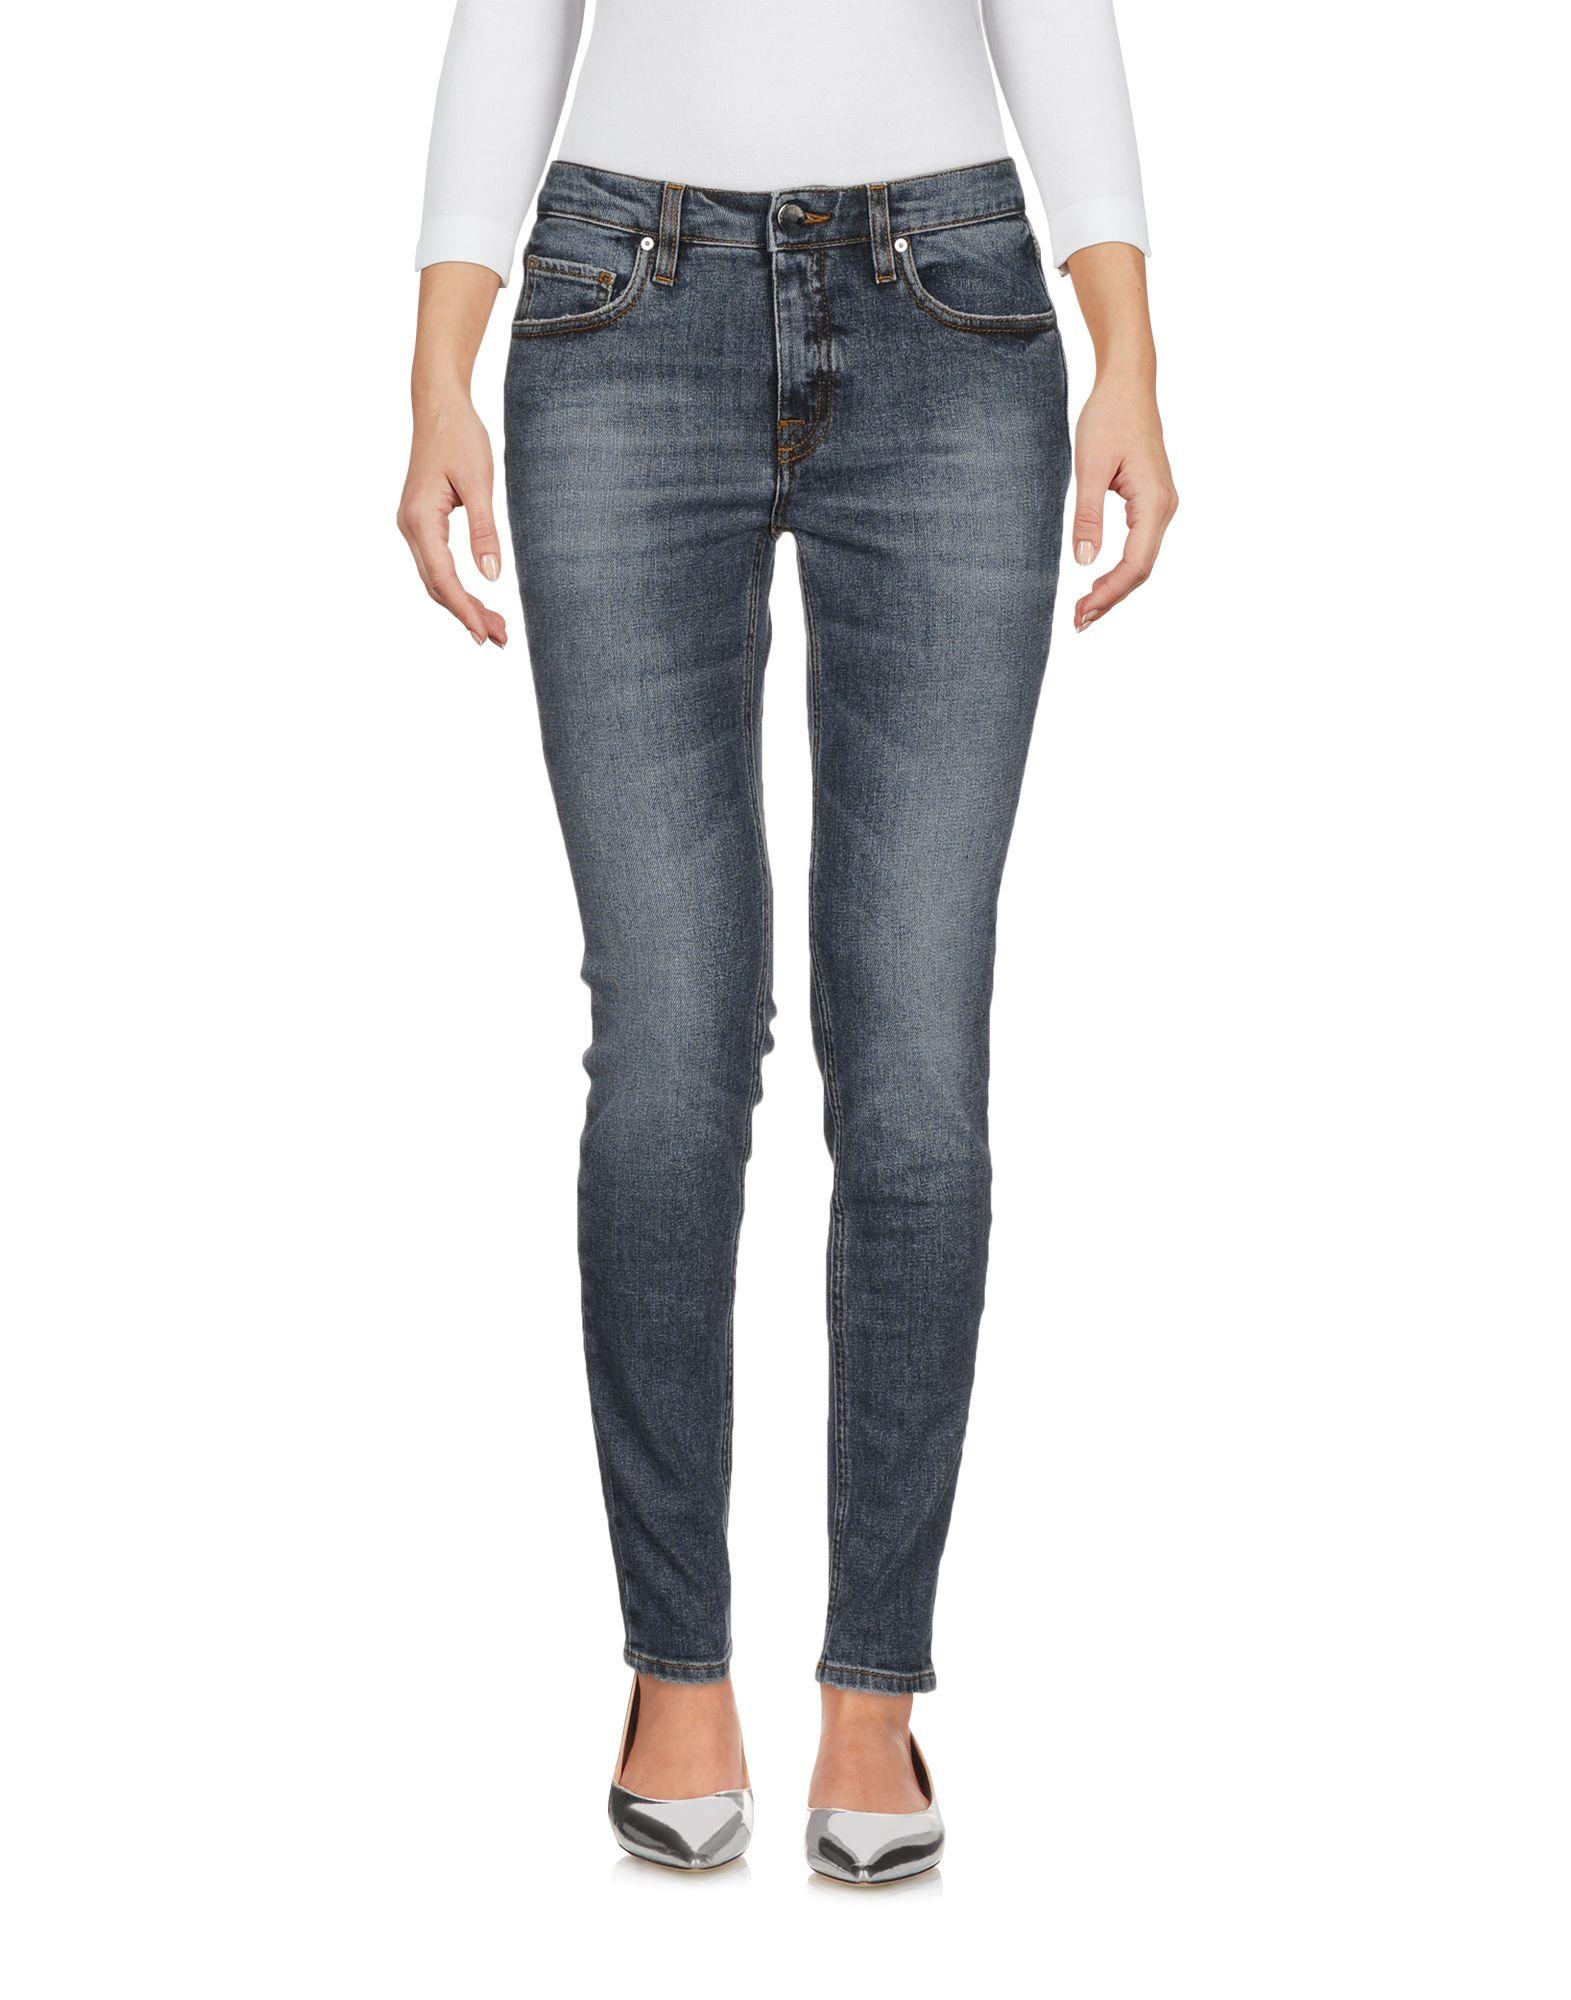 Pantaloni Jeans Victoria Beckham Denim Donna - Acquista online su mVmjLpI7